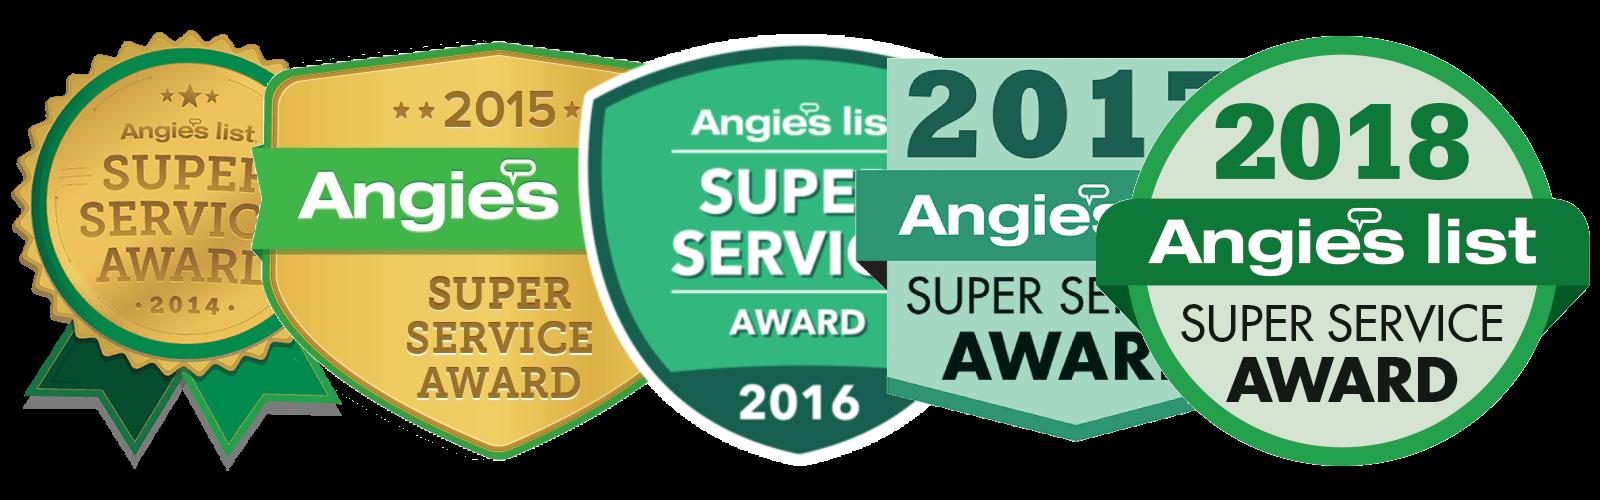 angies-awards-2.png